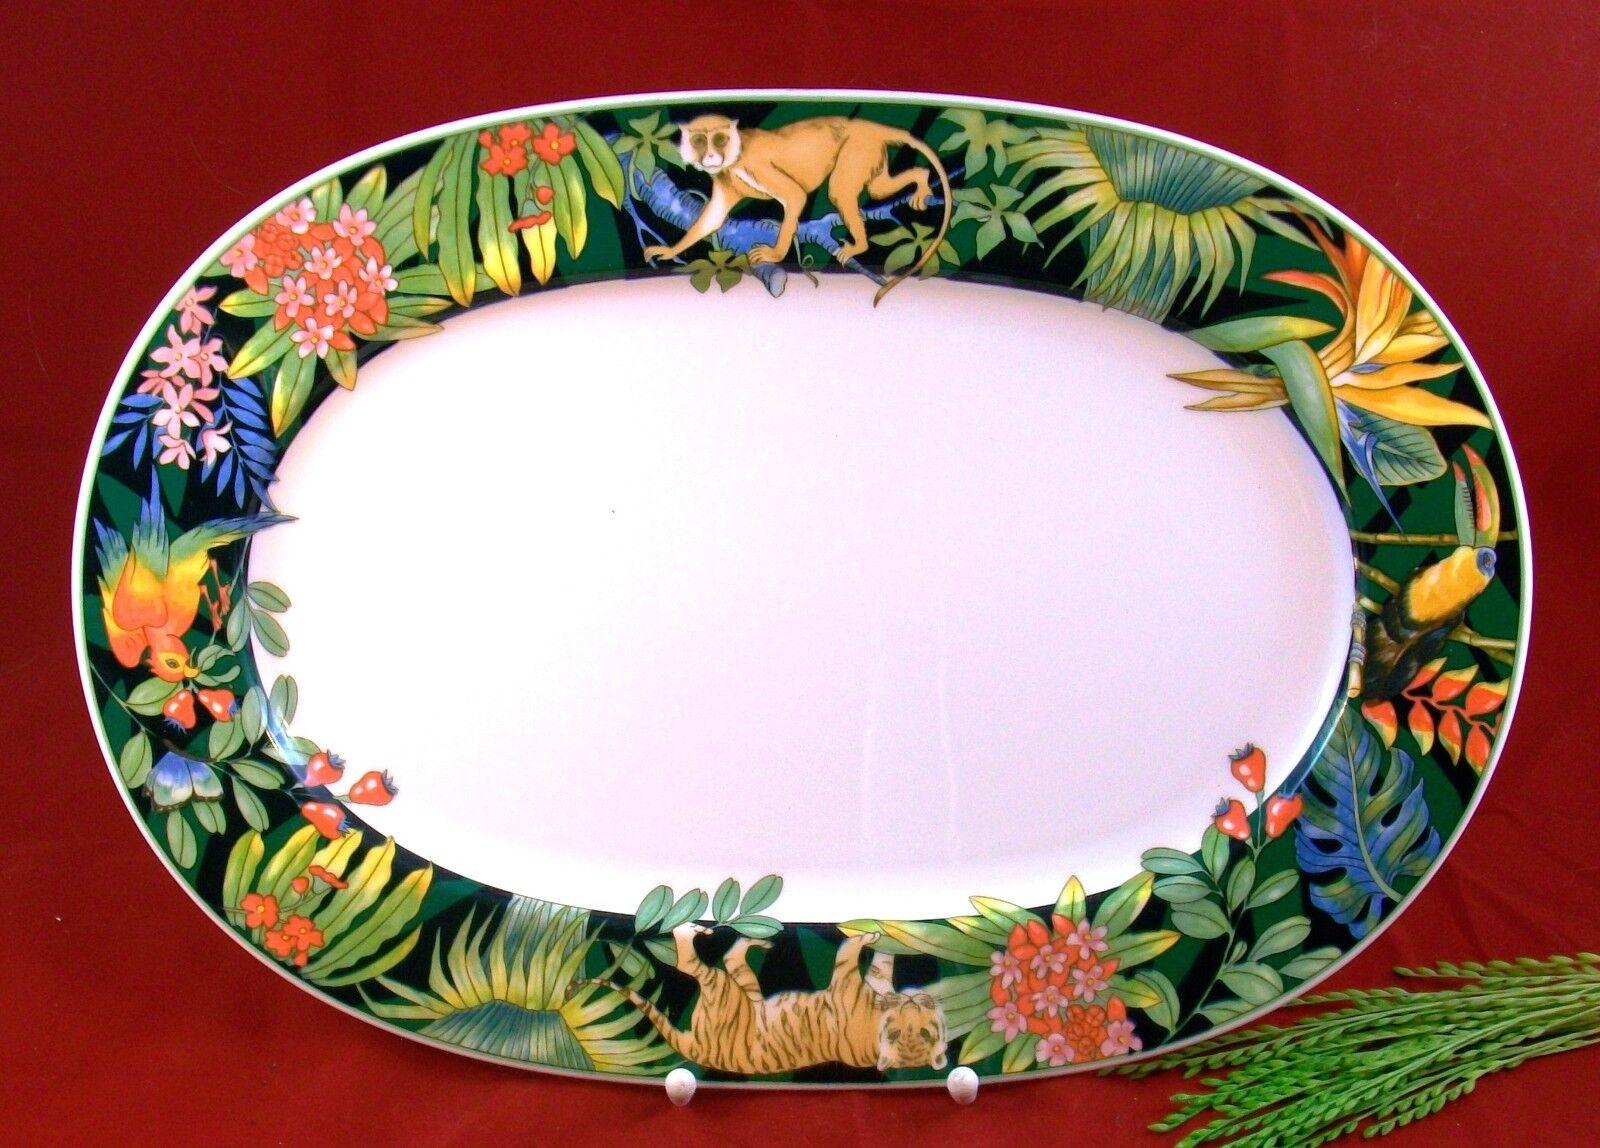 Serengeti - 1 plaque ovale 42 cm